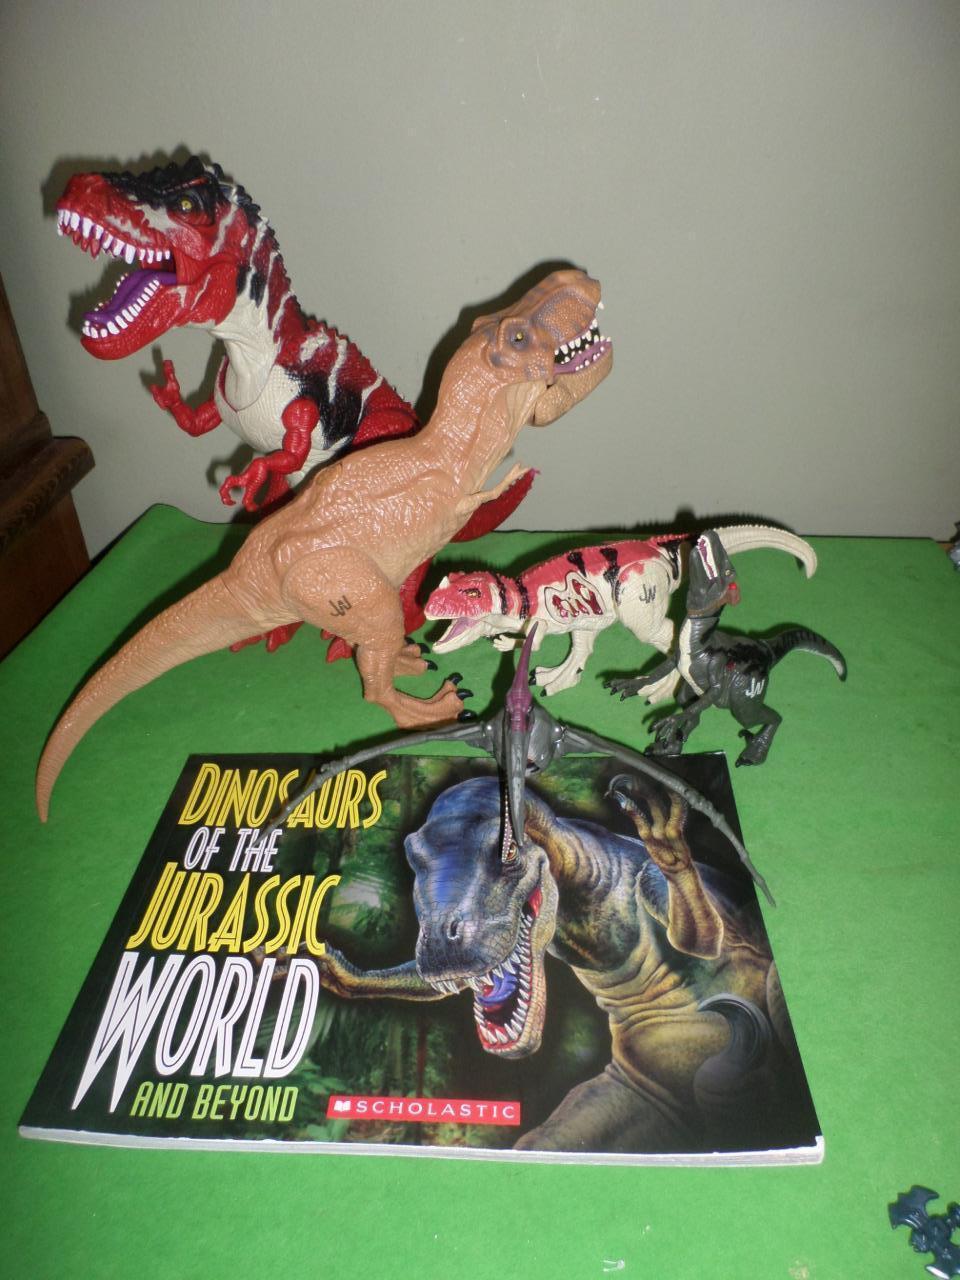 Jurrassic world dinosaurier pteranodon ceratosaurus velociraptor t - rex selten viel